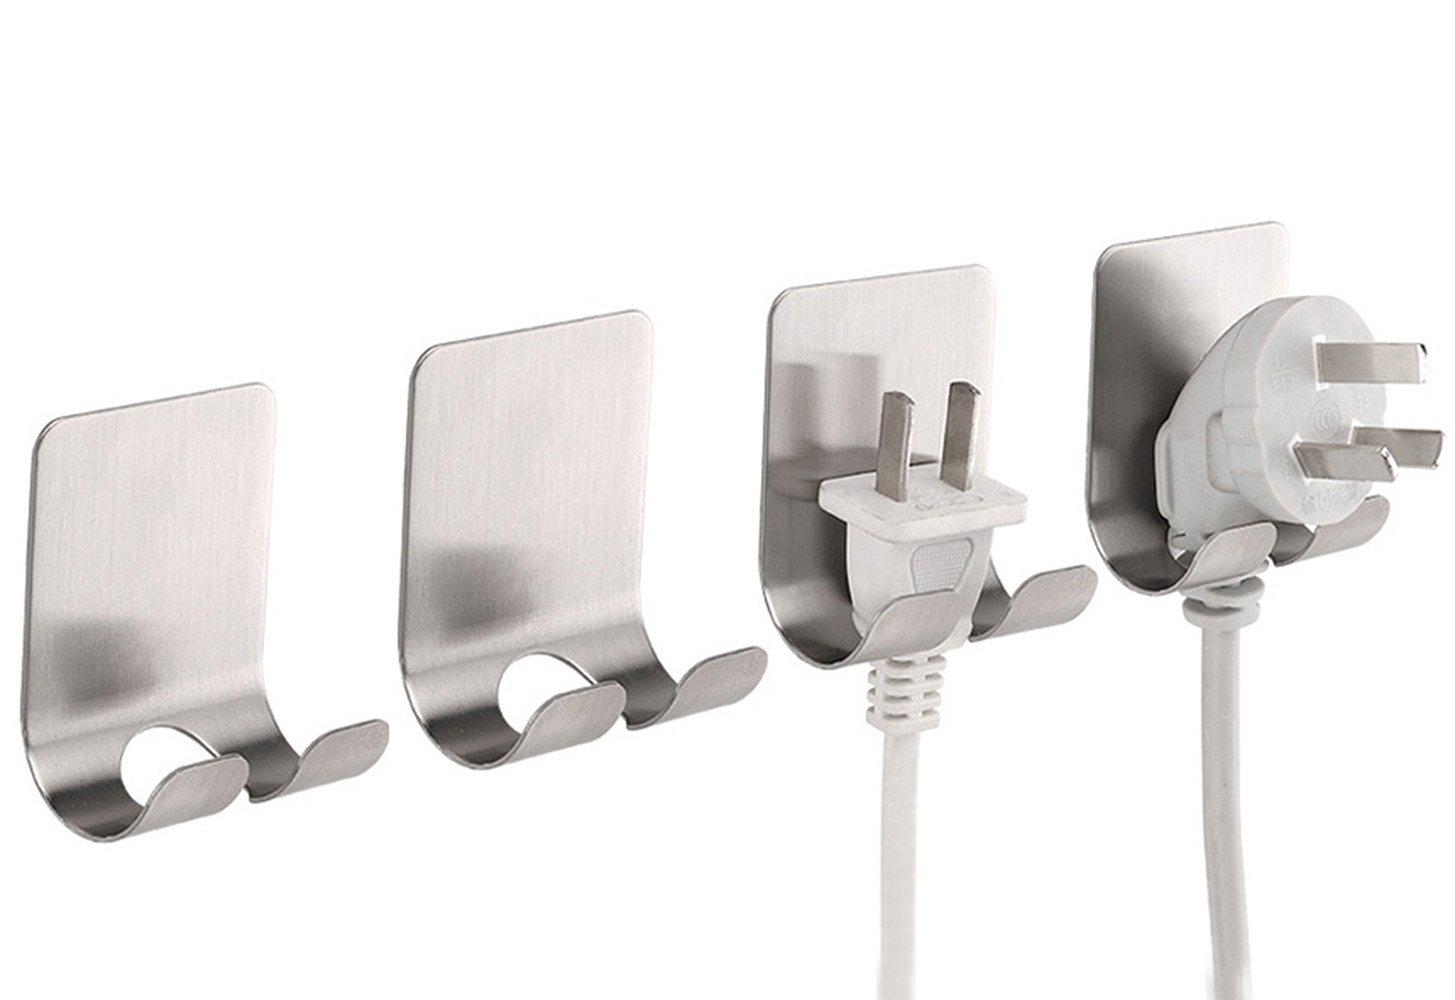 SYOOY 4 PCS Self Adhesive Shaving Wall Hooks Stainless Steel Power Plug Line Hooks Multi-Purpose Sticking Hooks